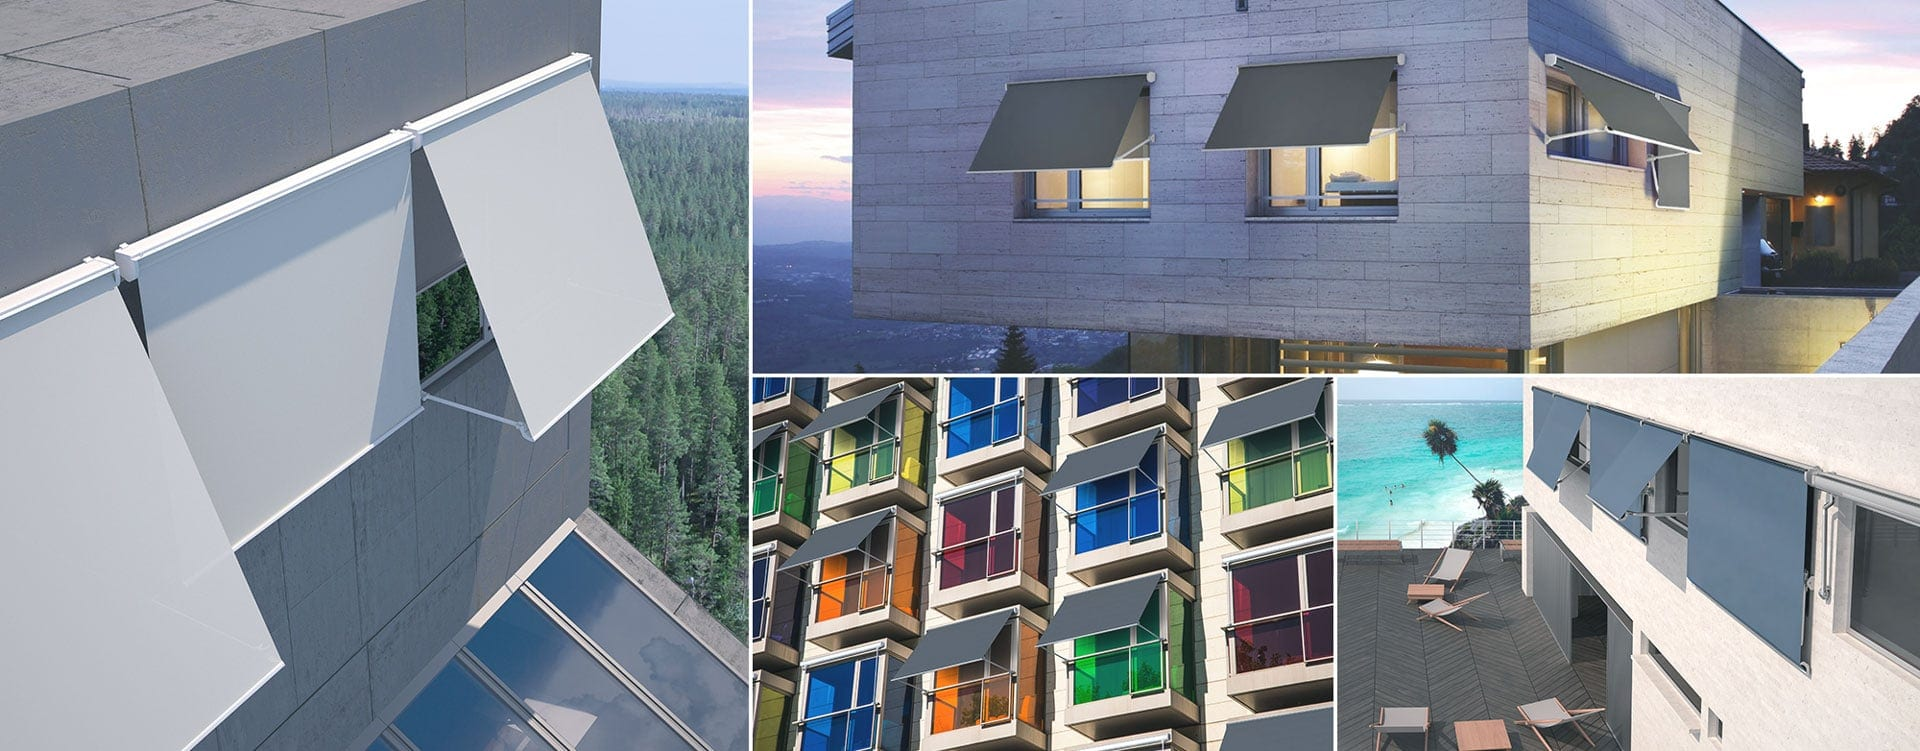 Okenske in balkonske tende